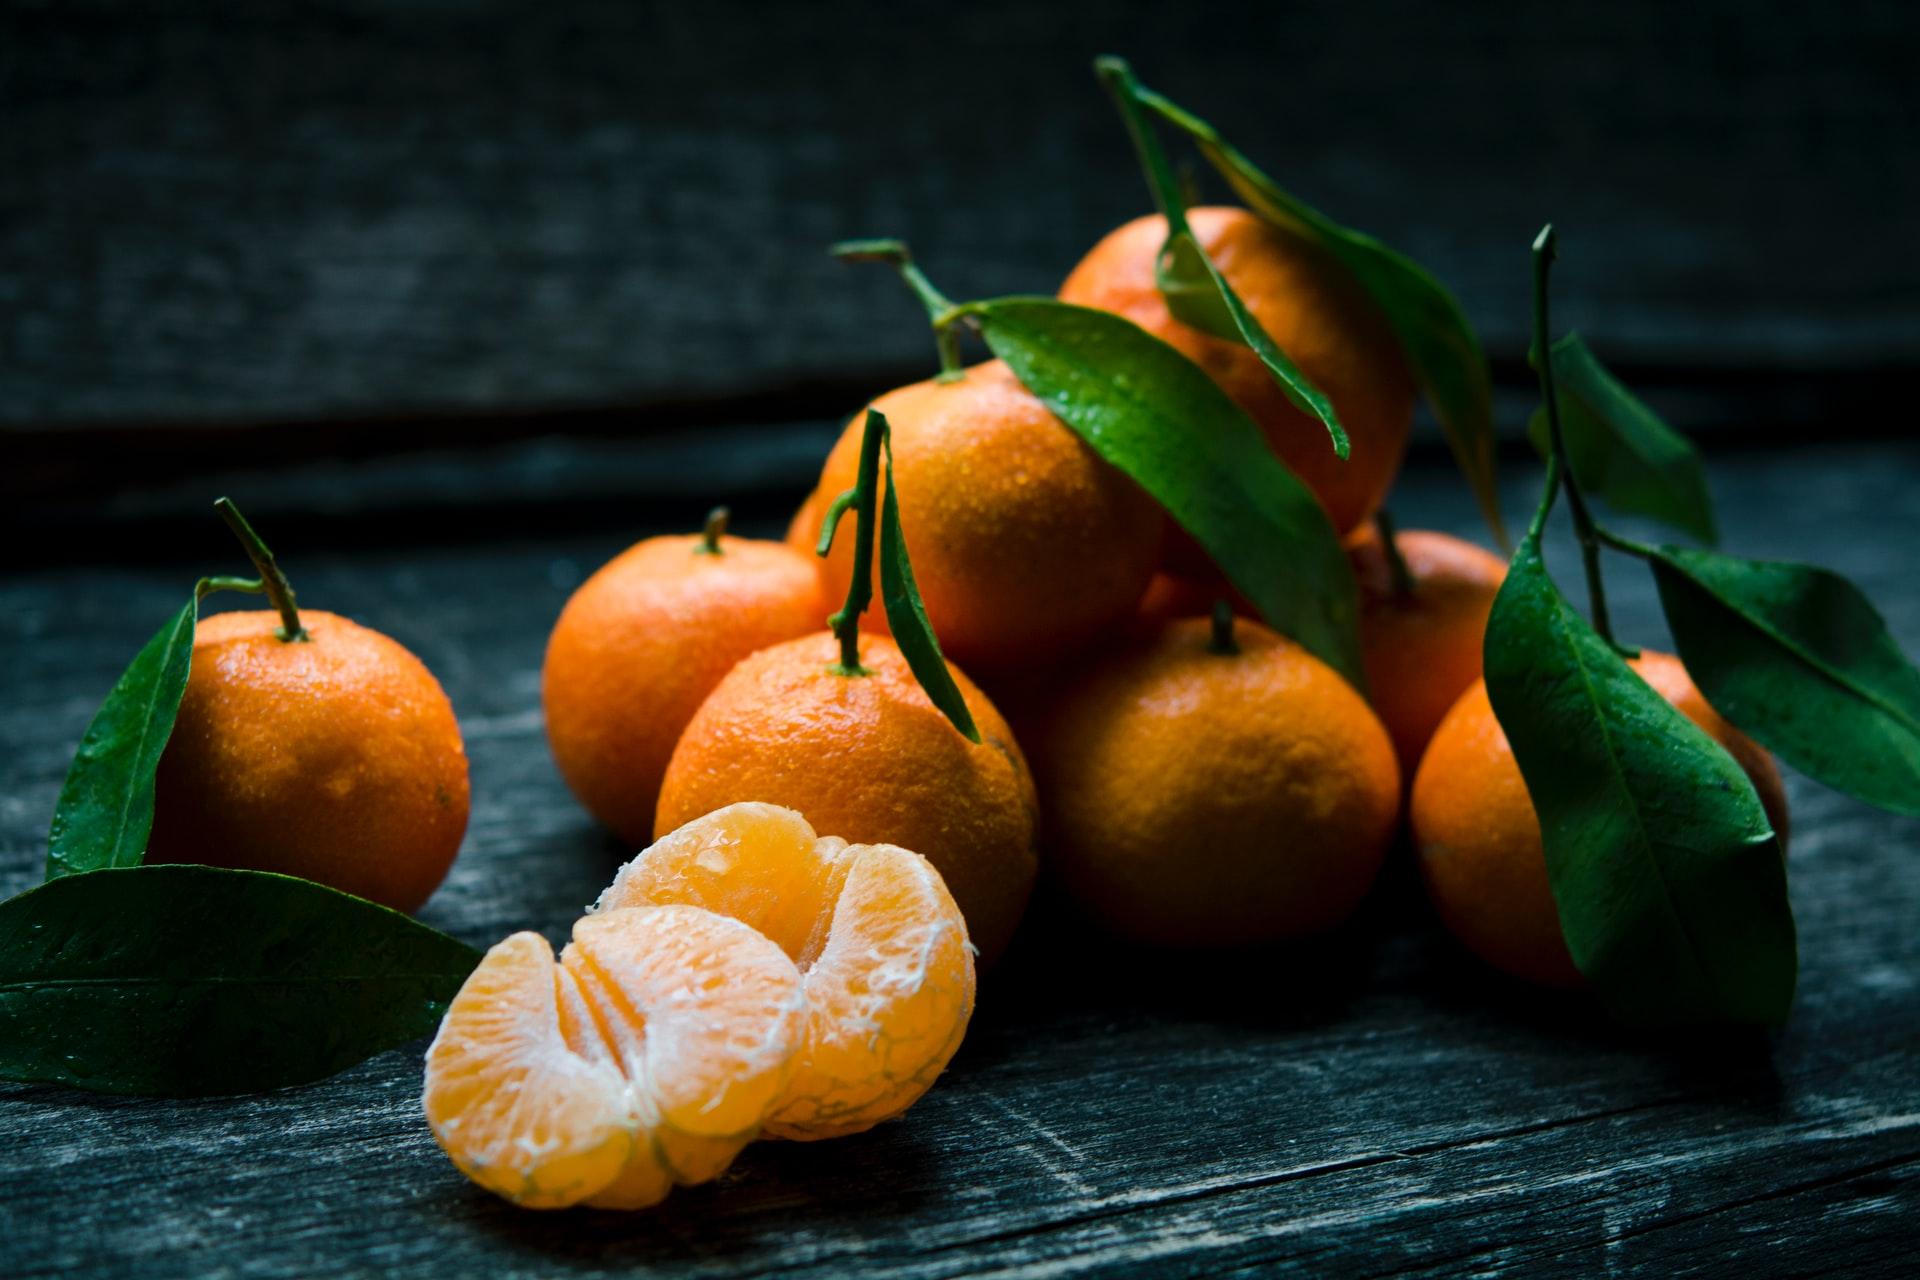 tecnica-del-mandarino